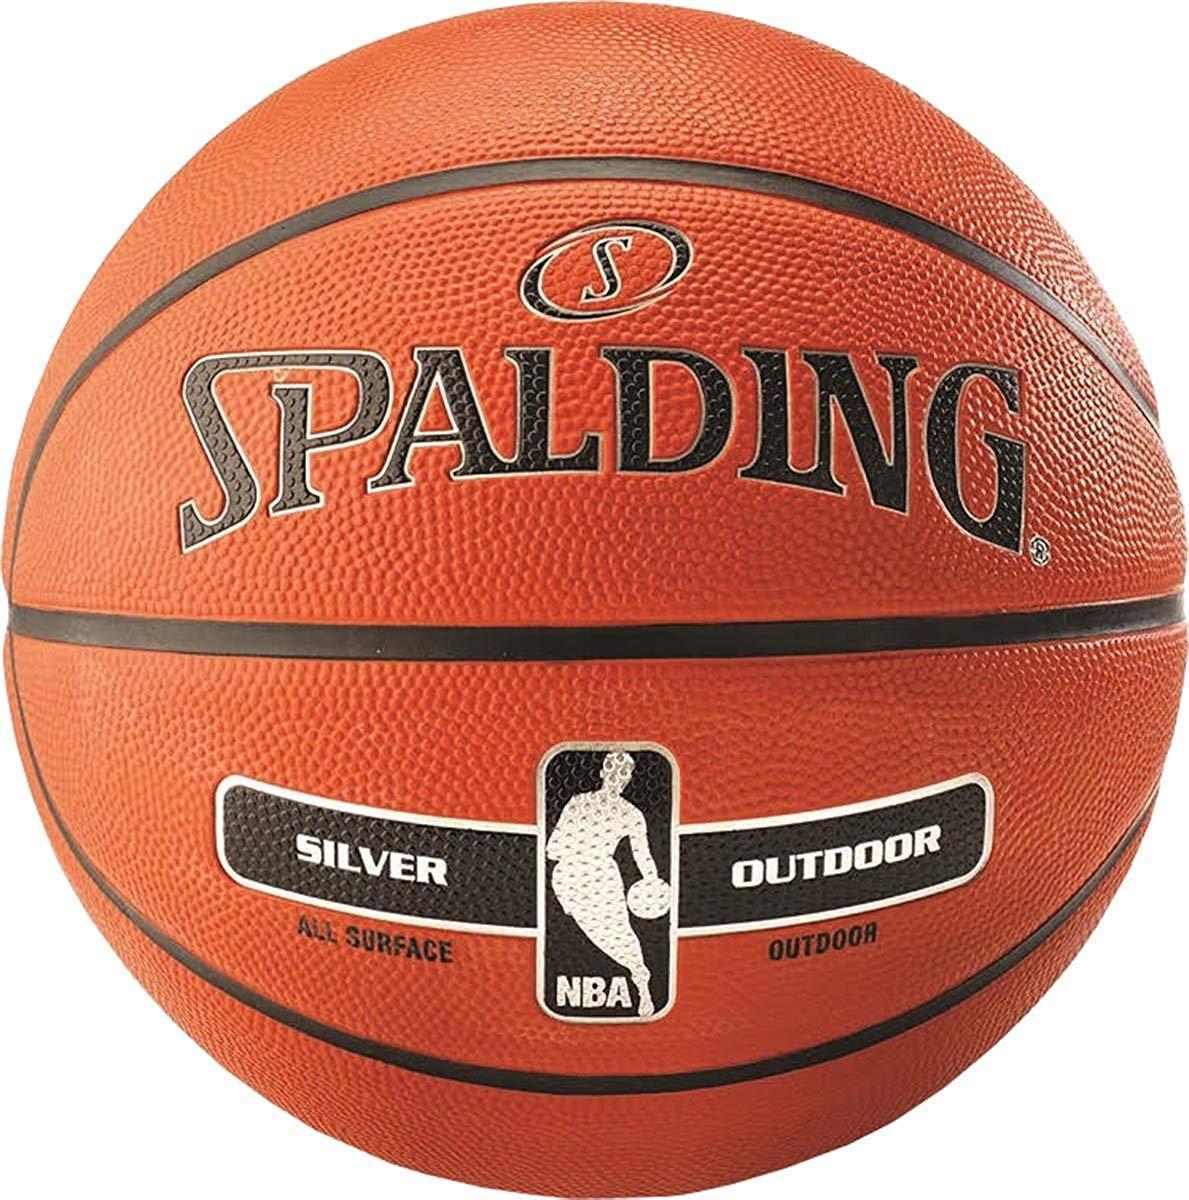 Мяч баскетбольный Spalding NBA Silver Outdoor Size 5